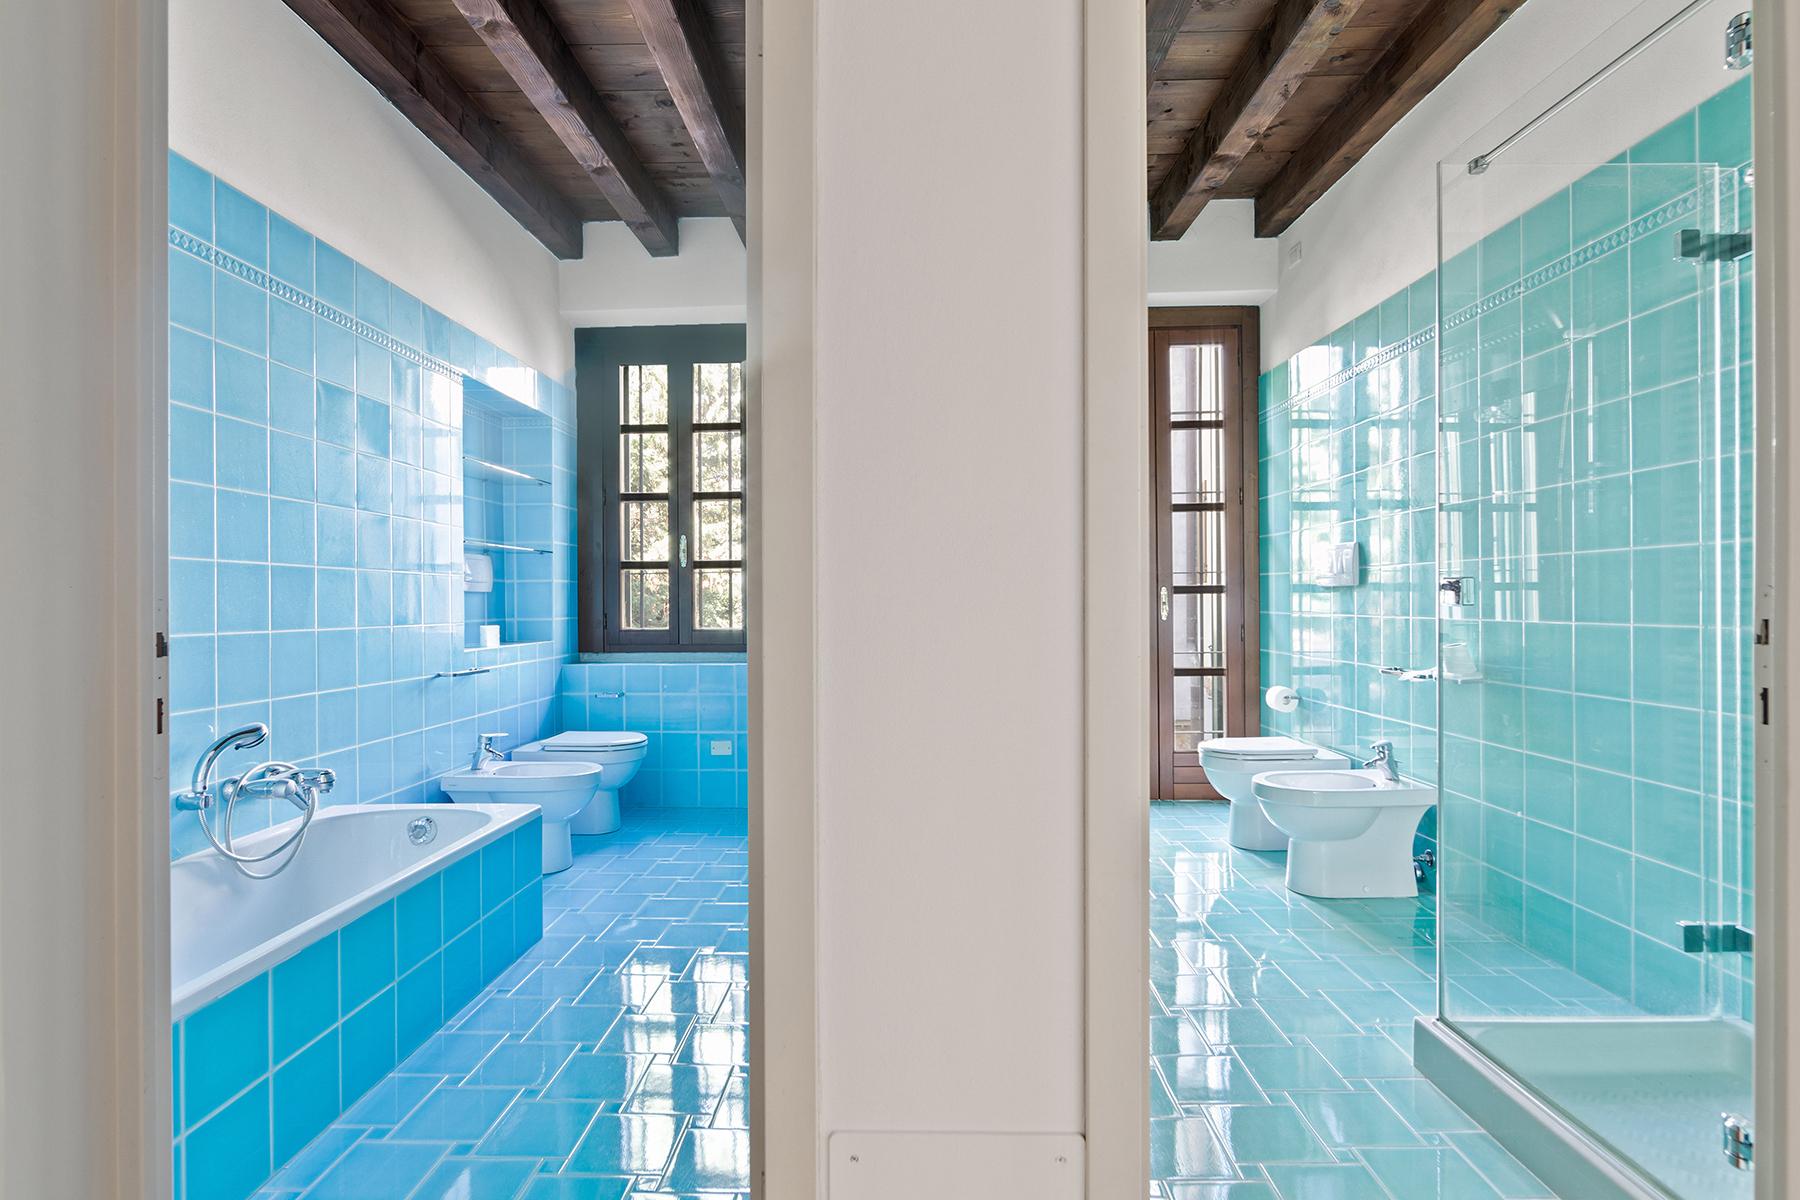 Villa in Vendita a Verona: 5 locali, 890 mq - Foto 18